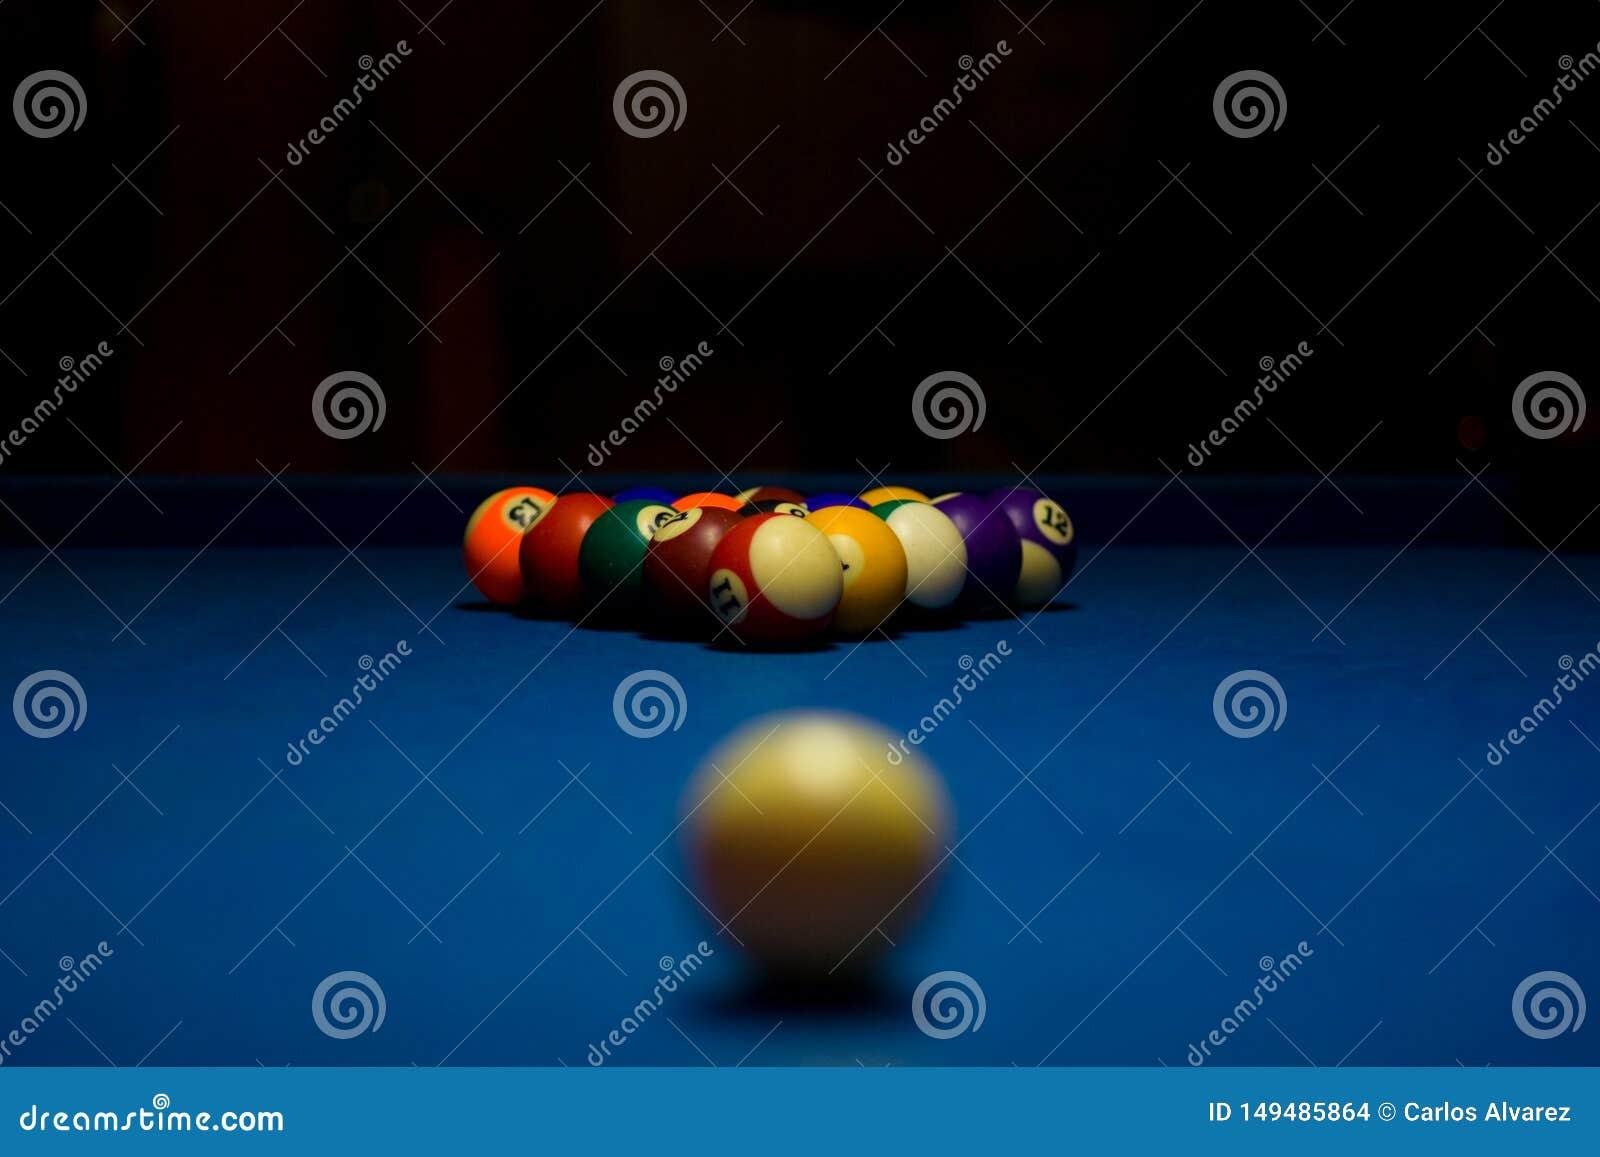 Billiard balls with white ball